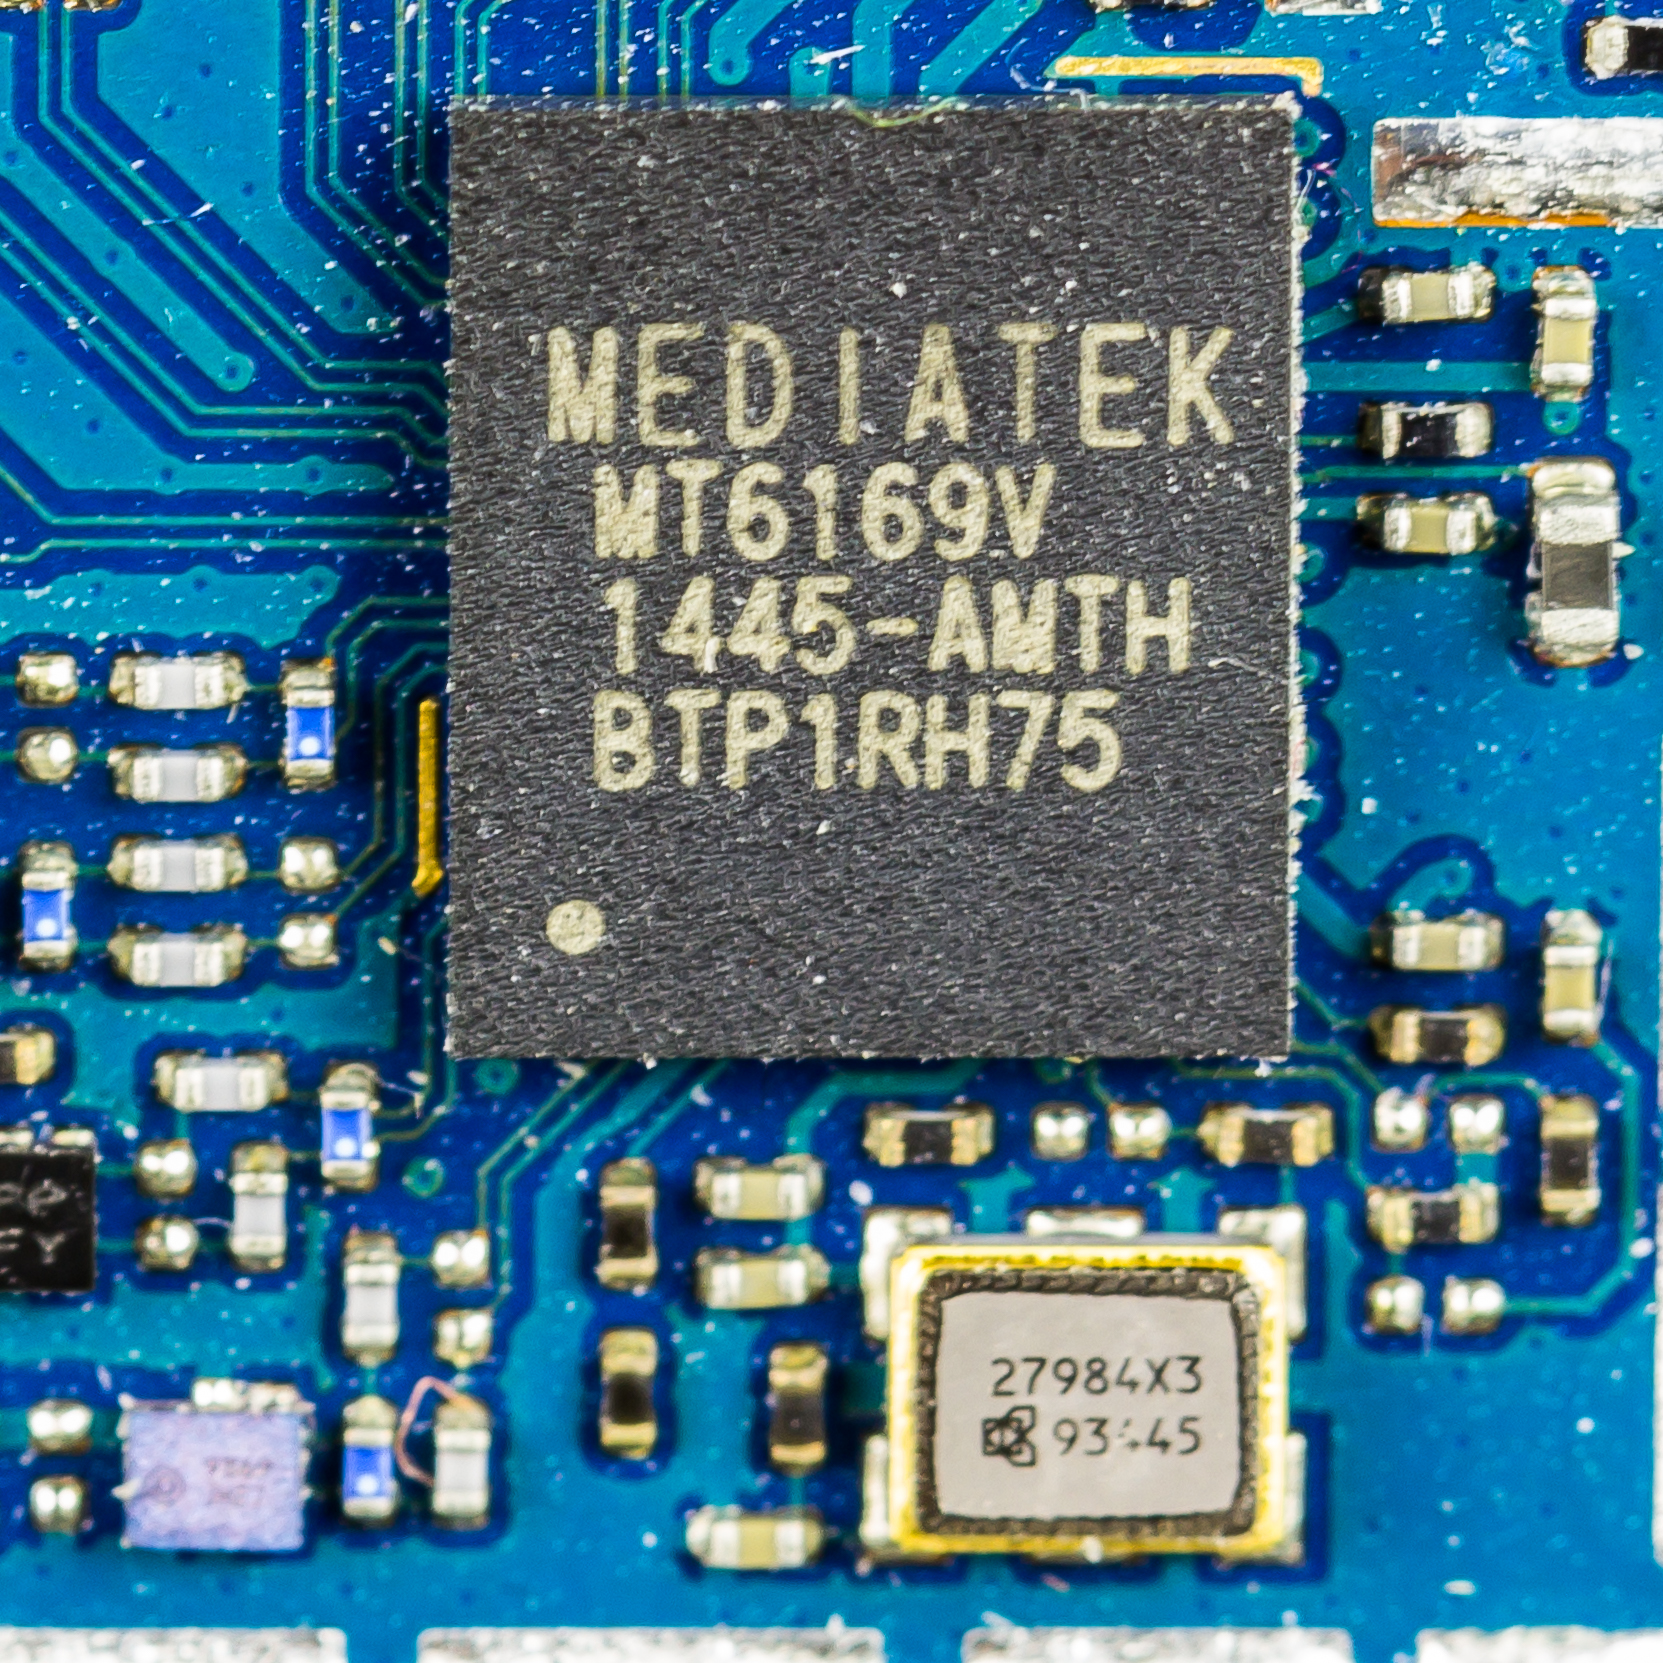 Filewiko Rainbow 4g Main Printed Circuit Board Mediatek Mt6169v Pictures 8624